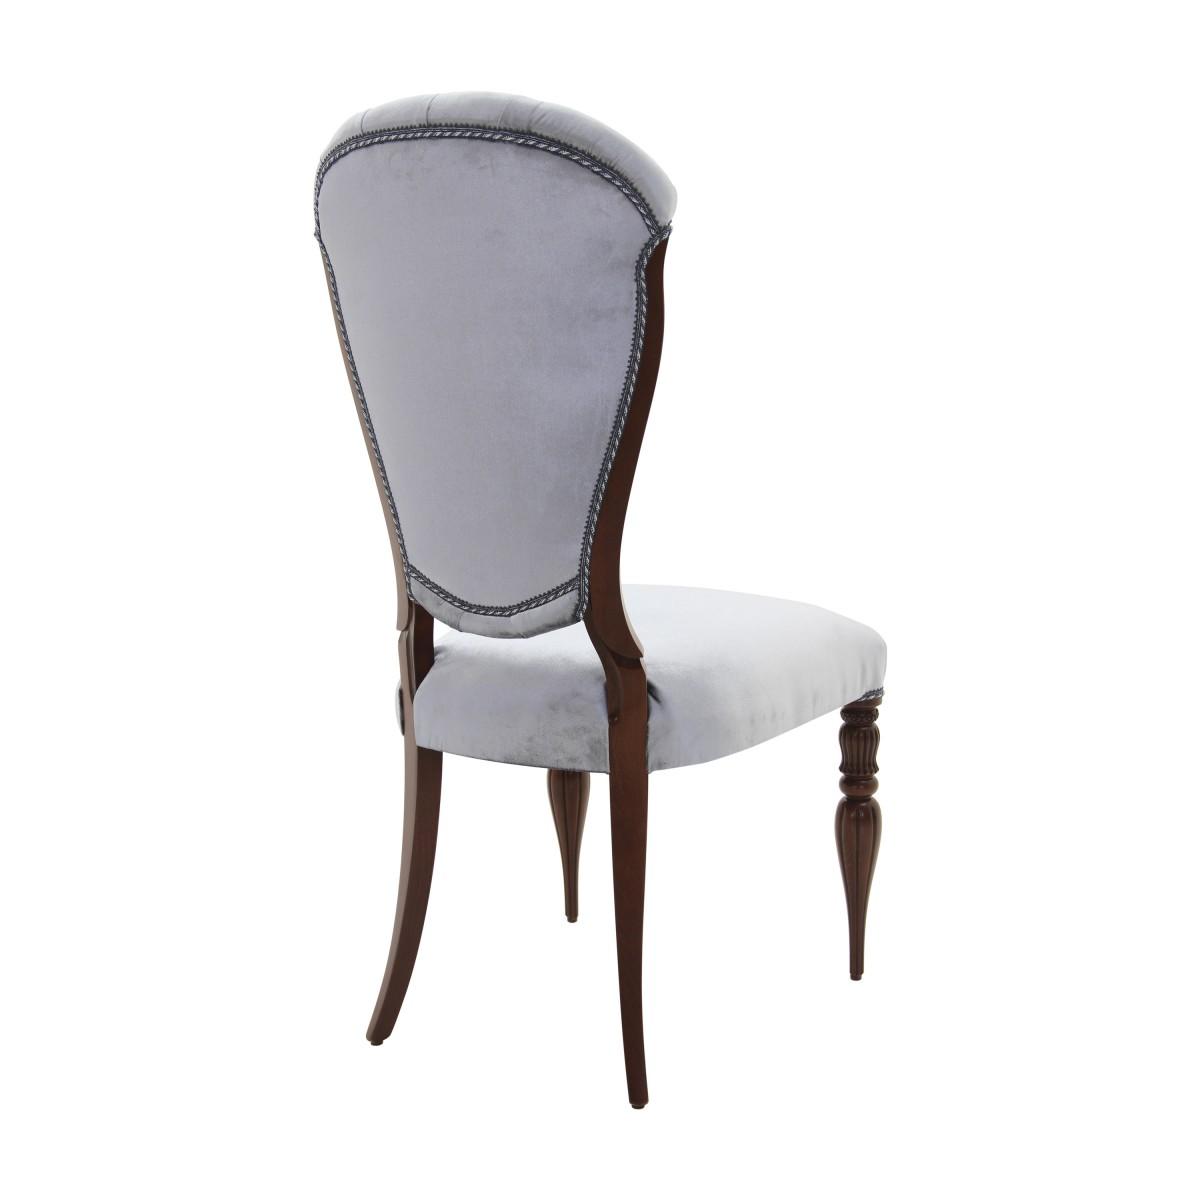 italian chair cremona 1 2851